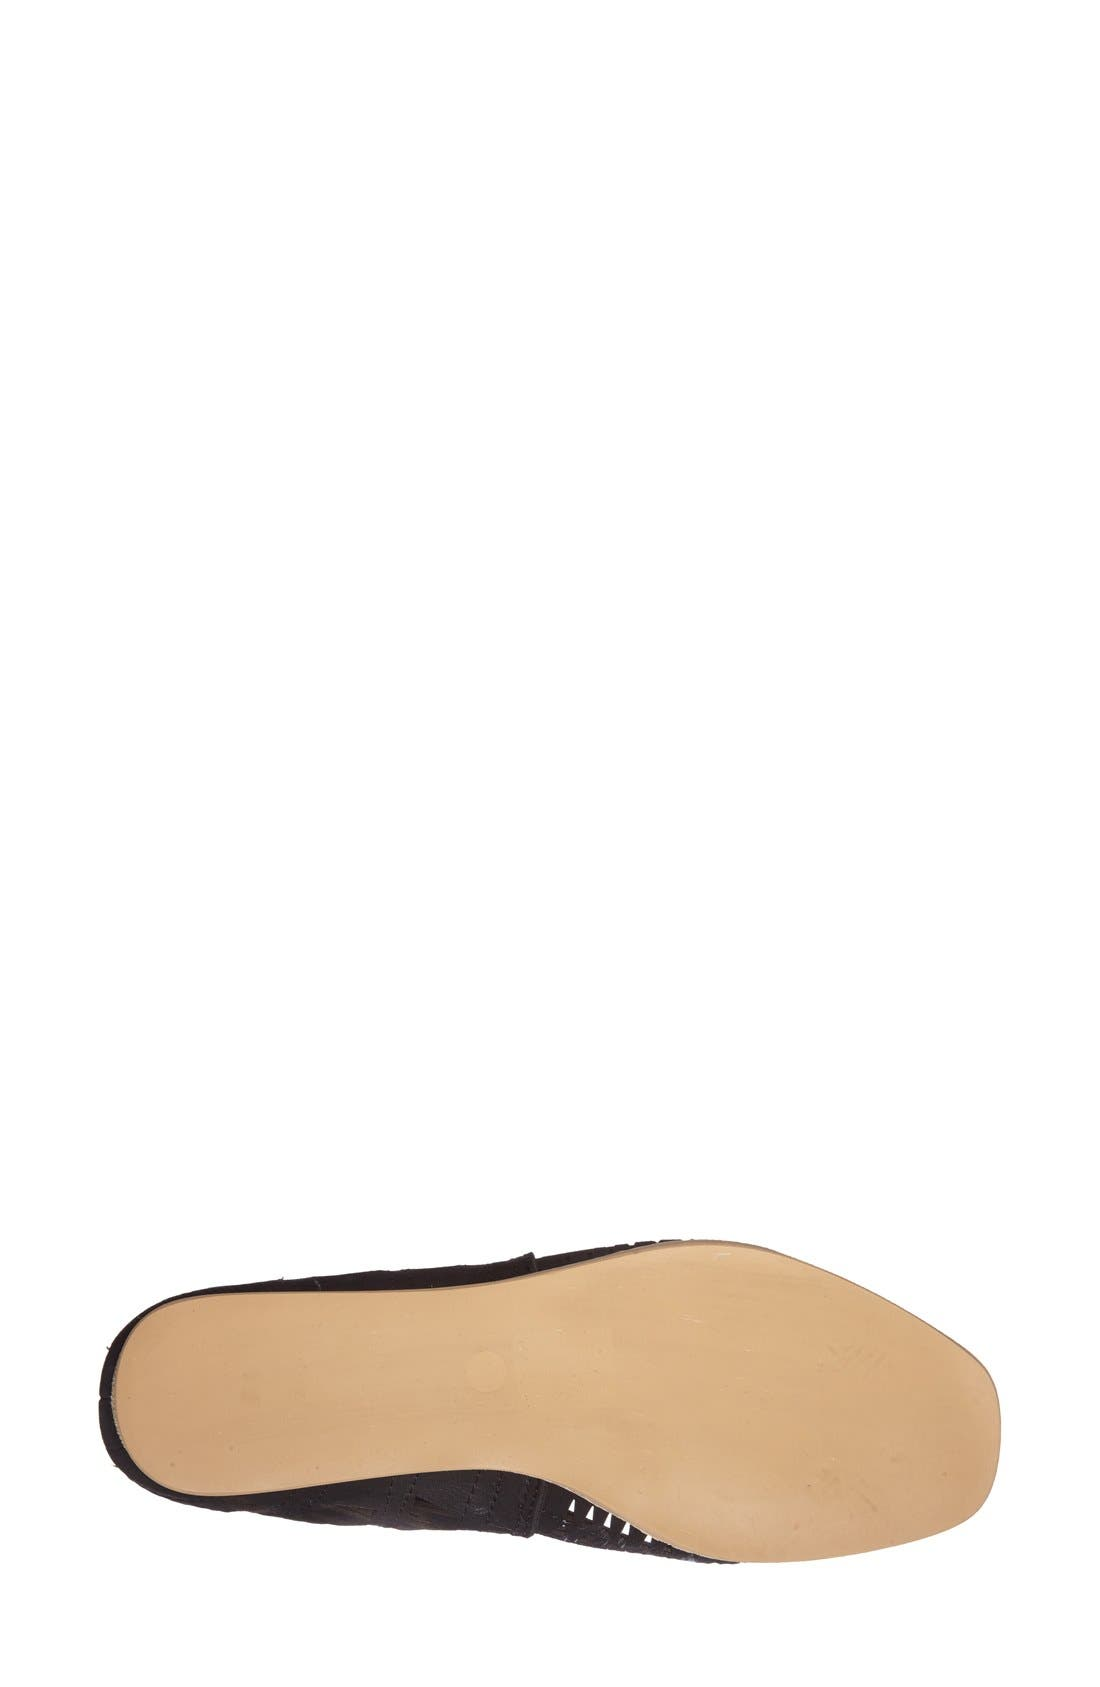 'Rodillo' Wedge Sandal,                             Alternate thumbnail 4, color,                             BLACK LEATHER